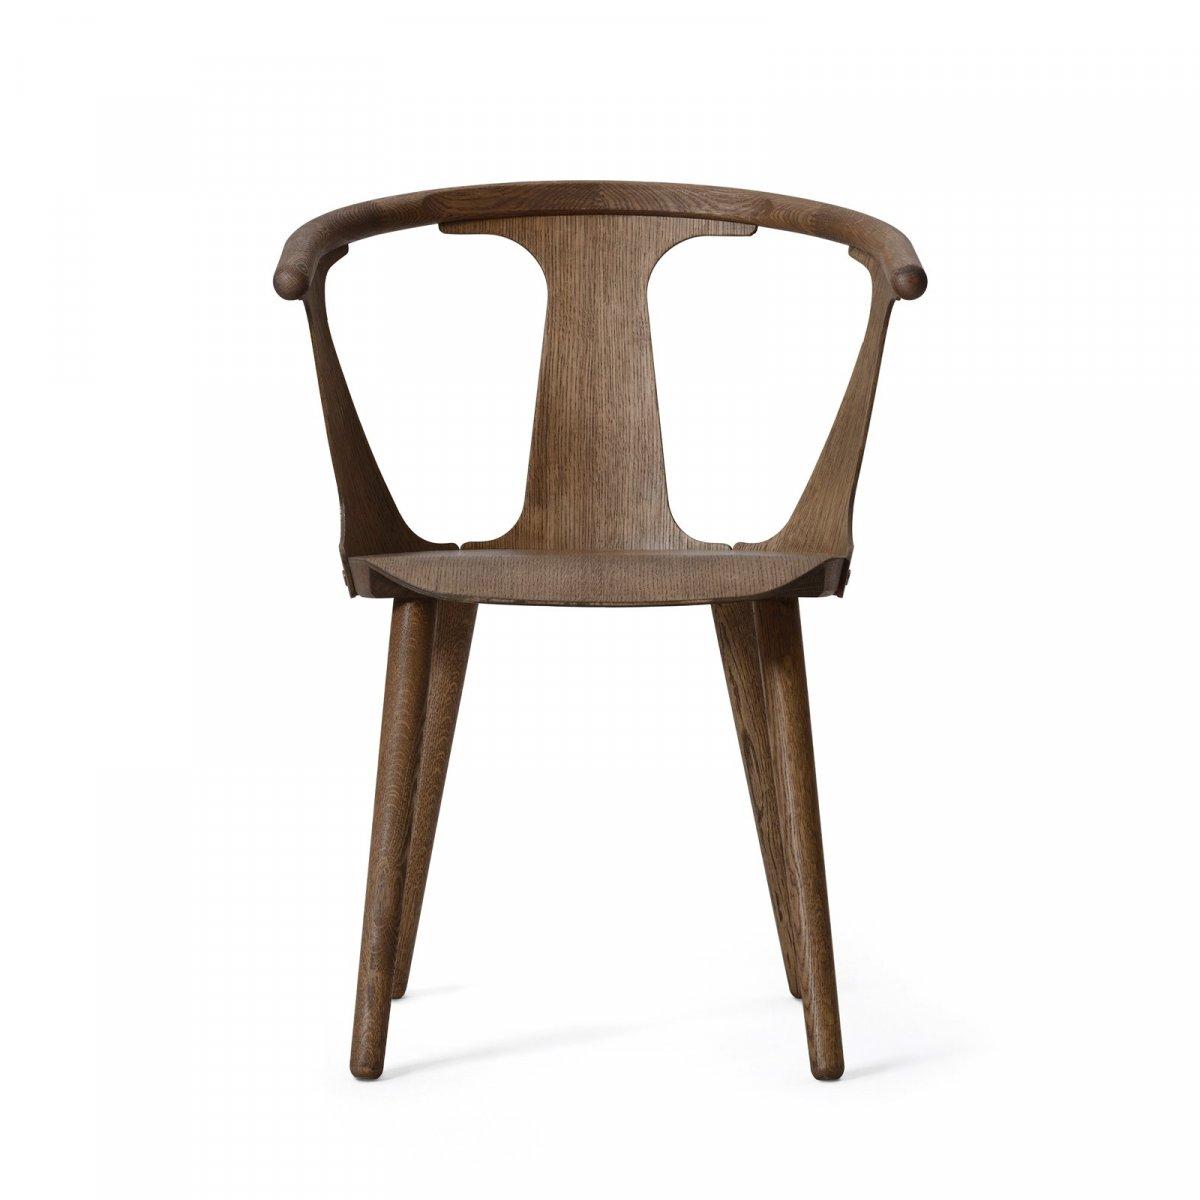 In Between Chair SK1, smoked oiled oak.